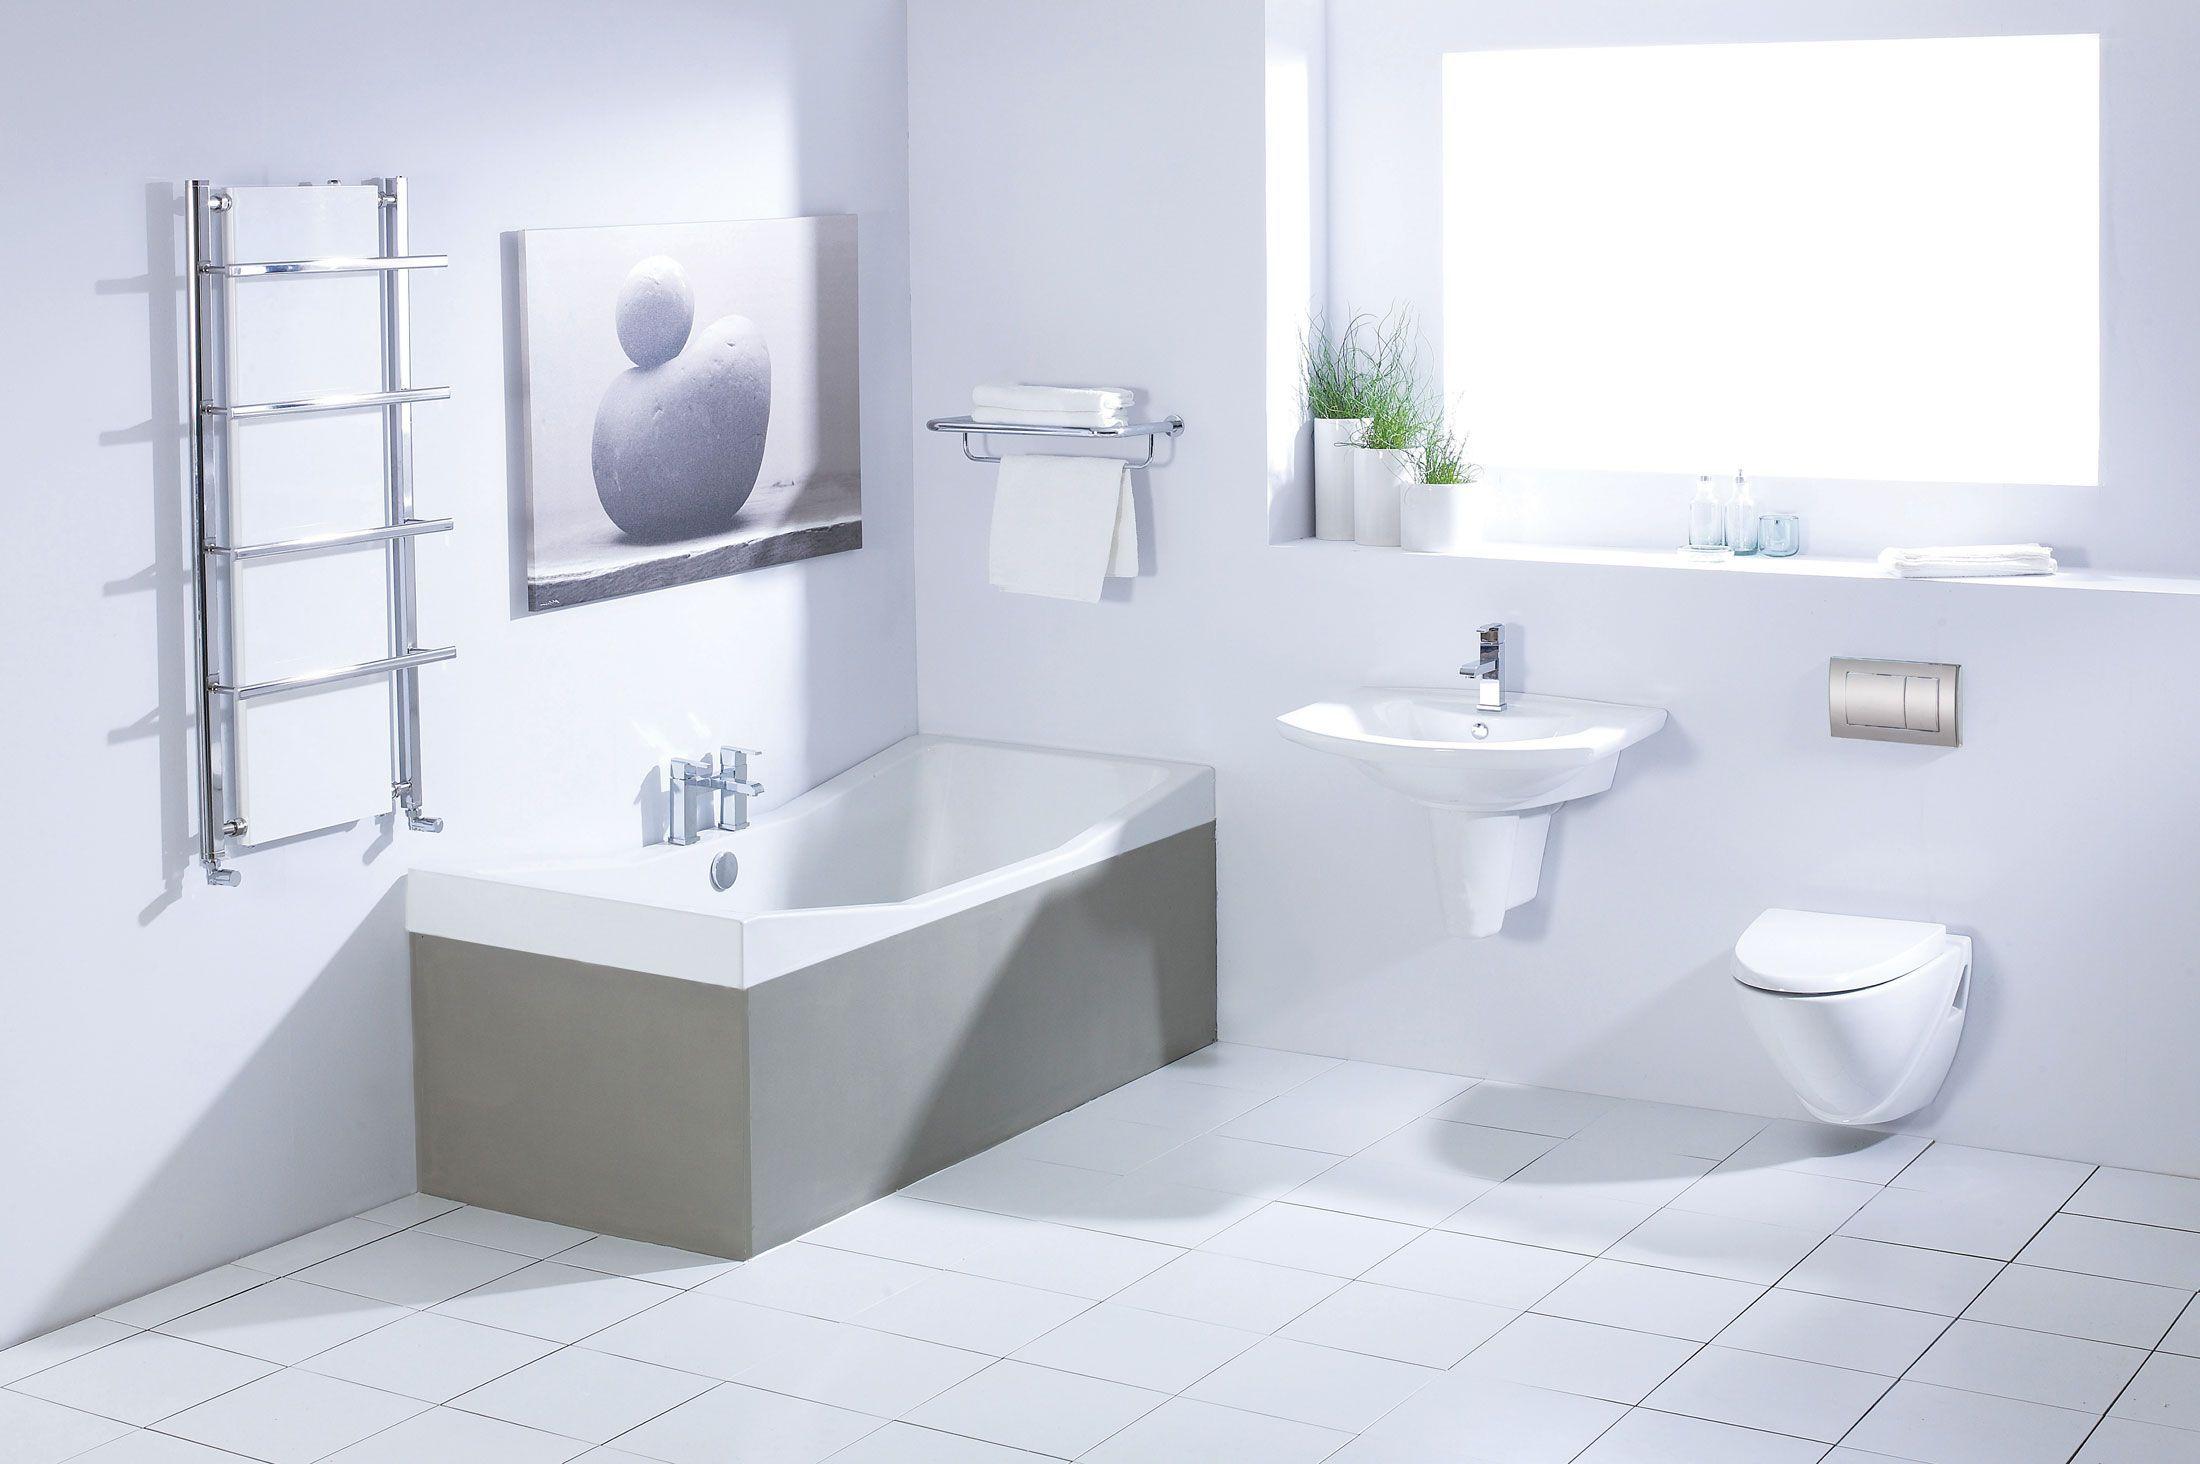 Image result for bathroom layout | Home Design Ideas | Pinterest ...